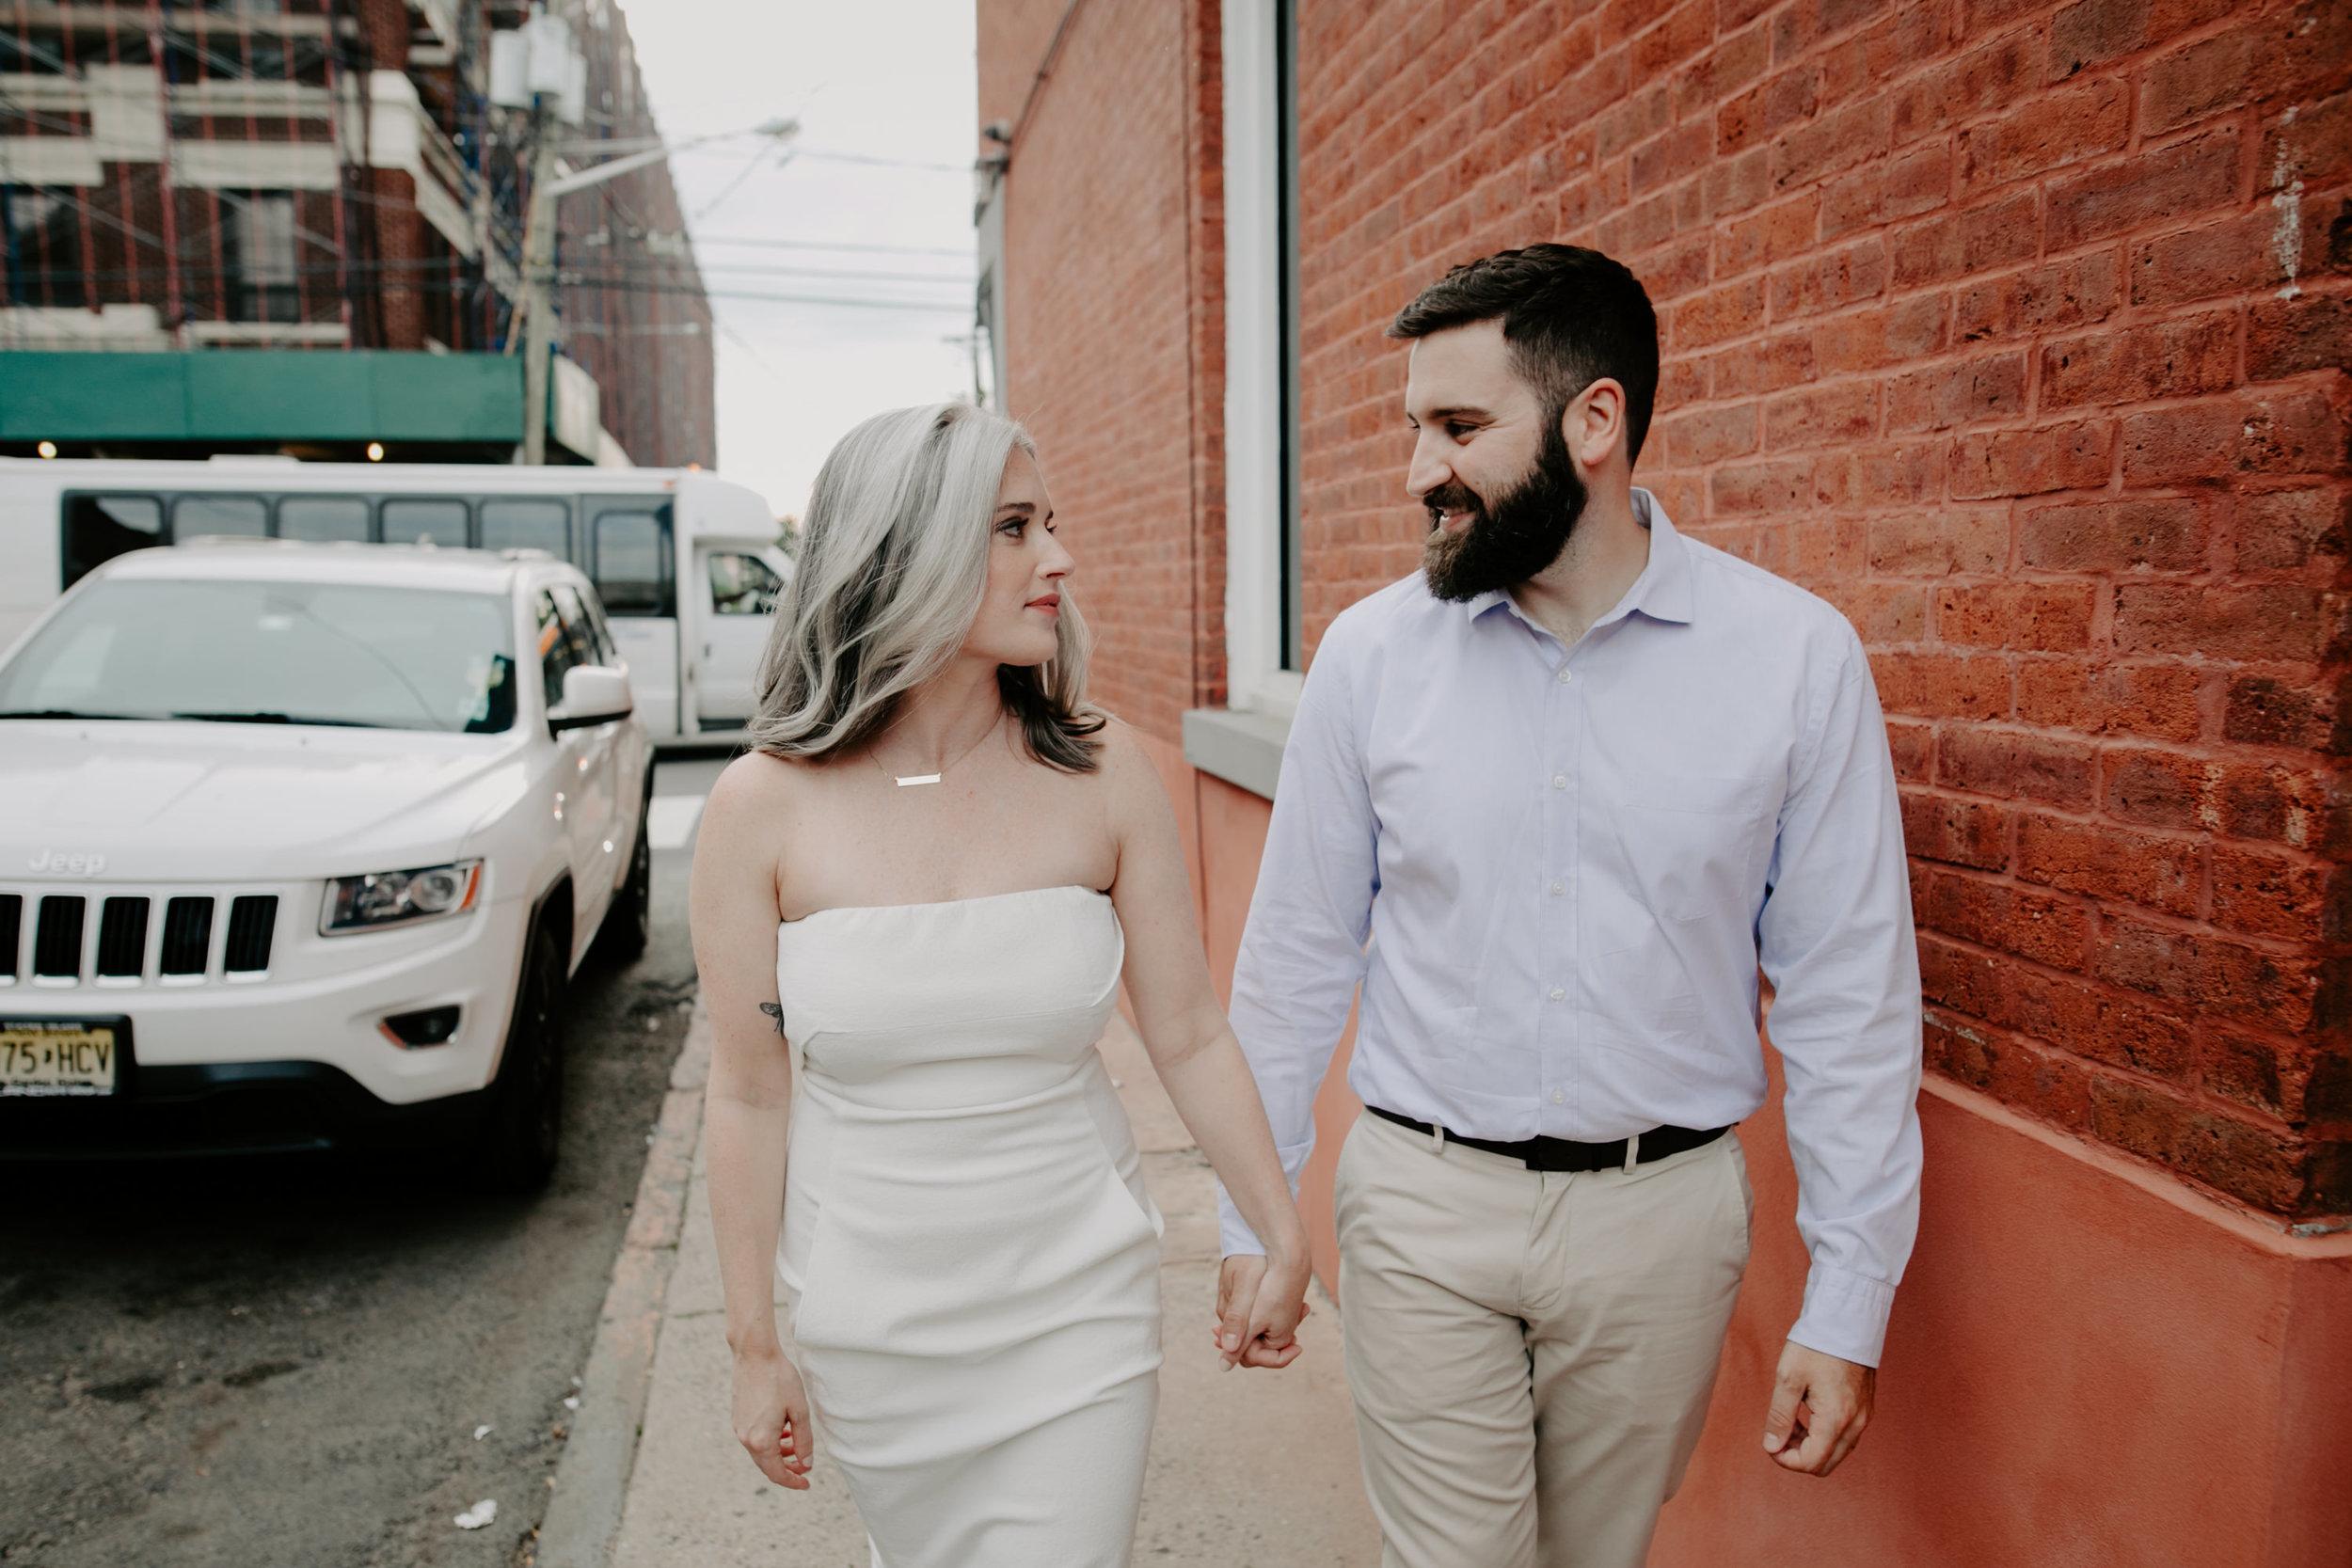 KateMax_JerseyCity_Lofi_Wedding_TowardsTheMoon-10.jpg